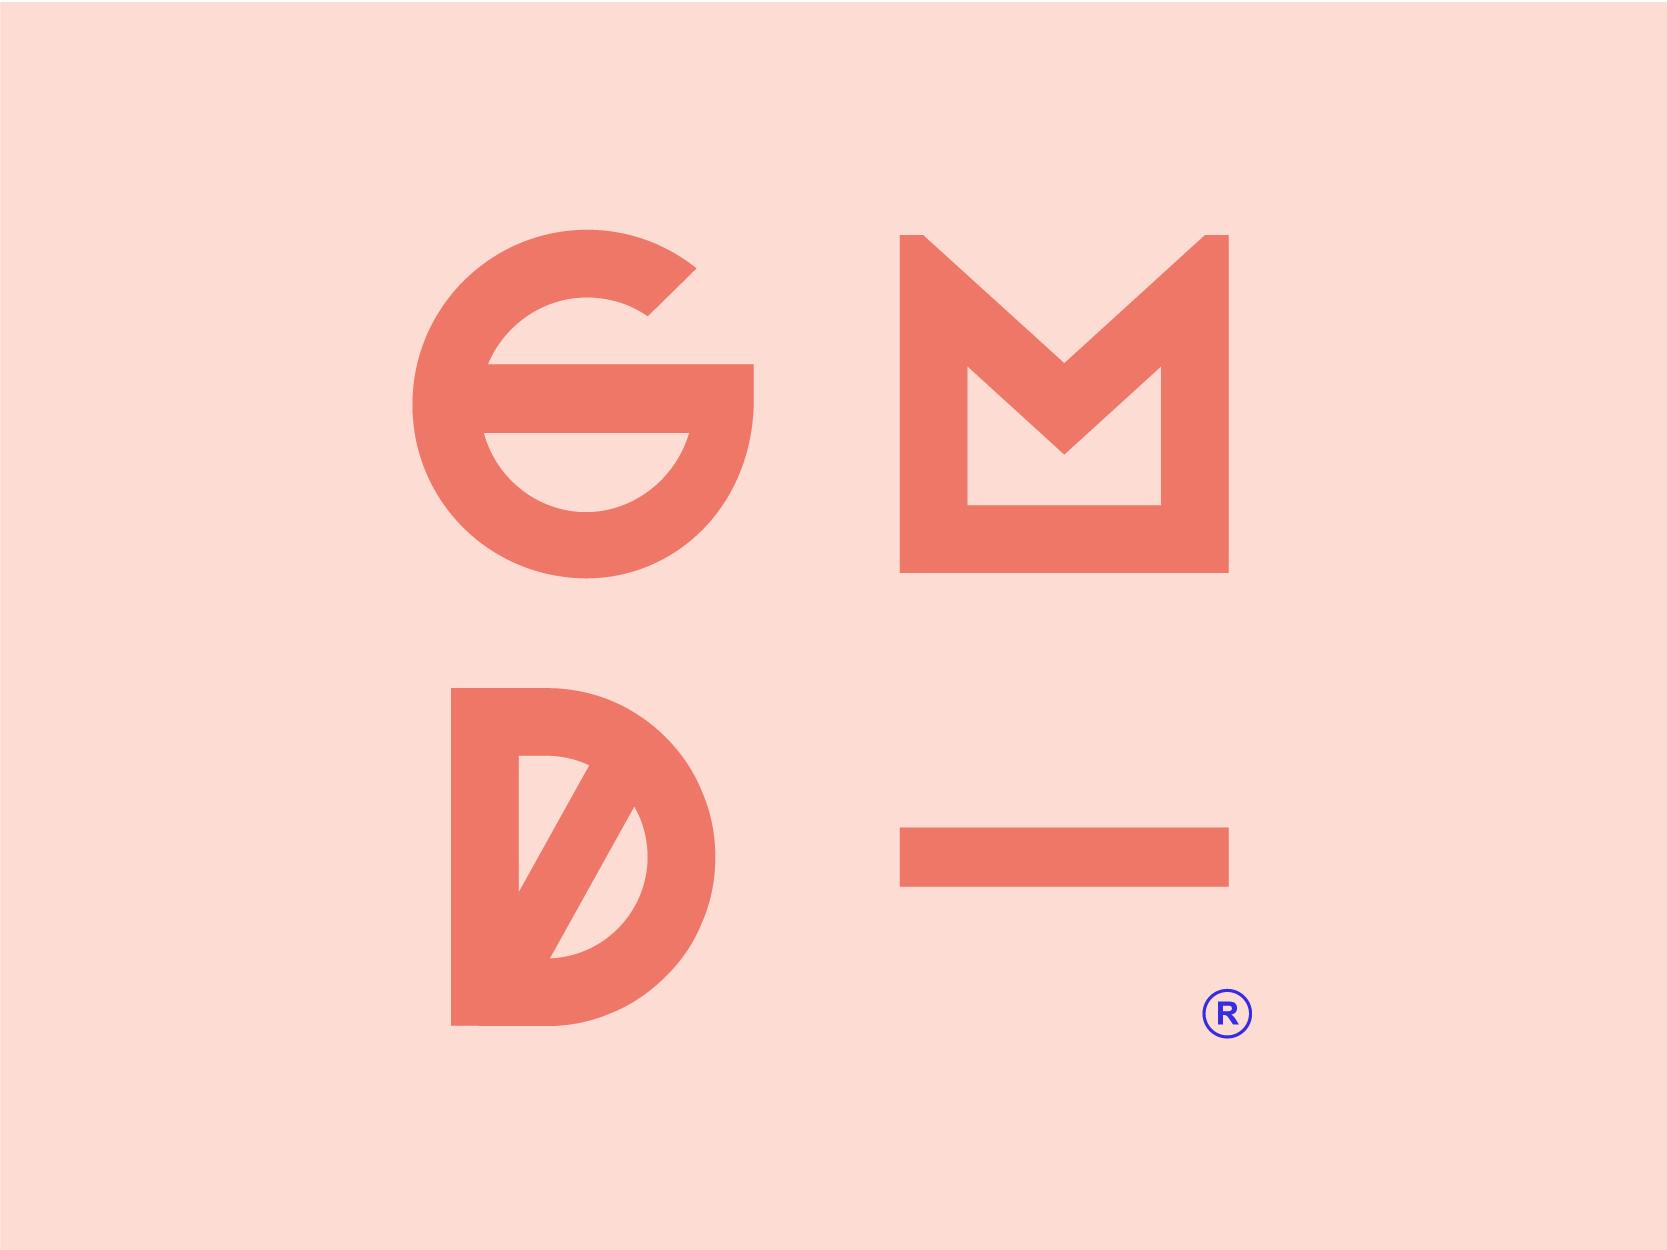 GURL Museum Day Logo 2019